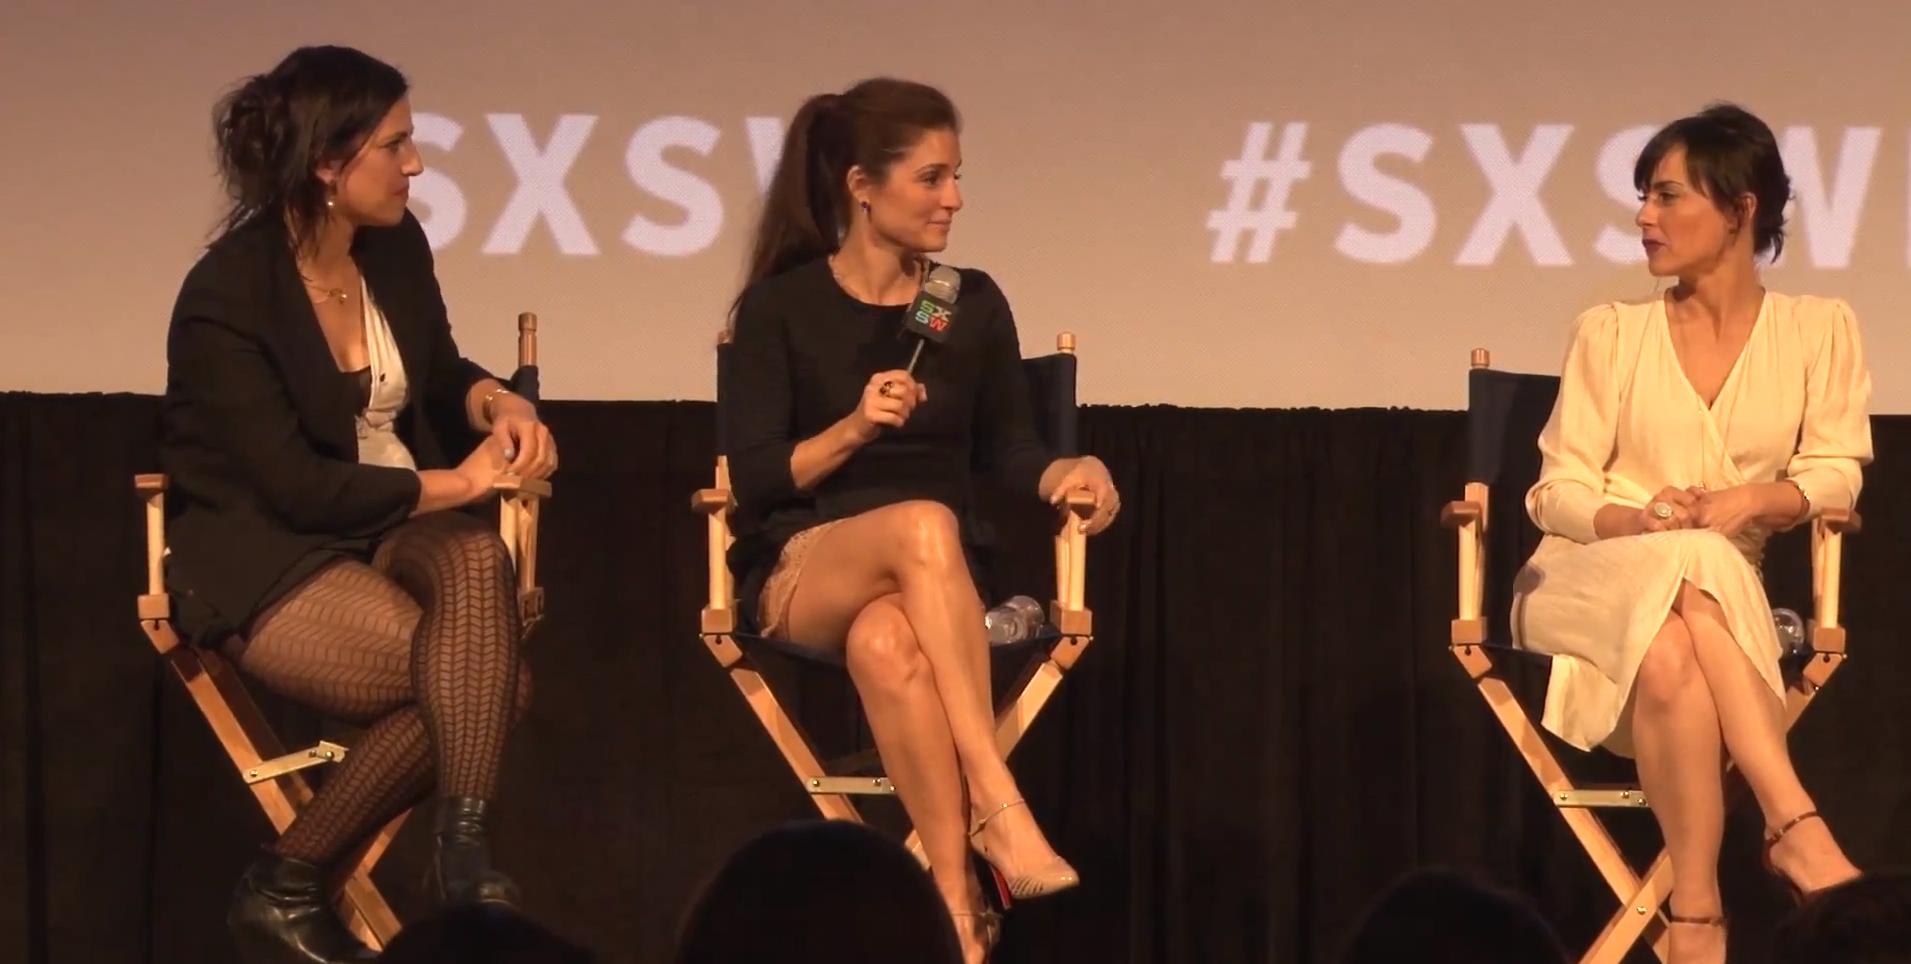 UnREAL Q&A, SXSW 2015. Image by: SXSW / YouTube